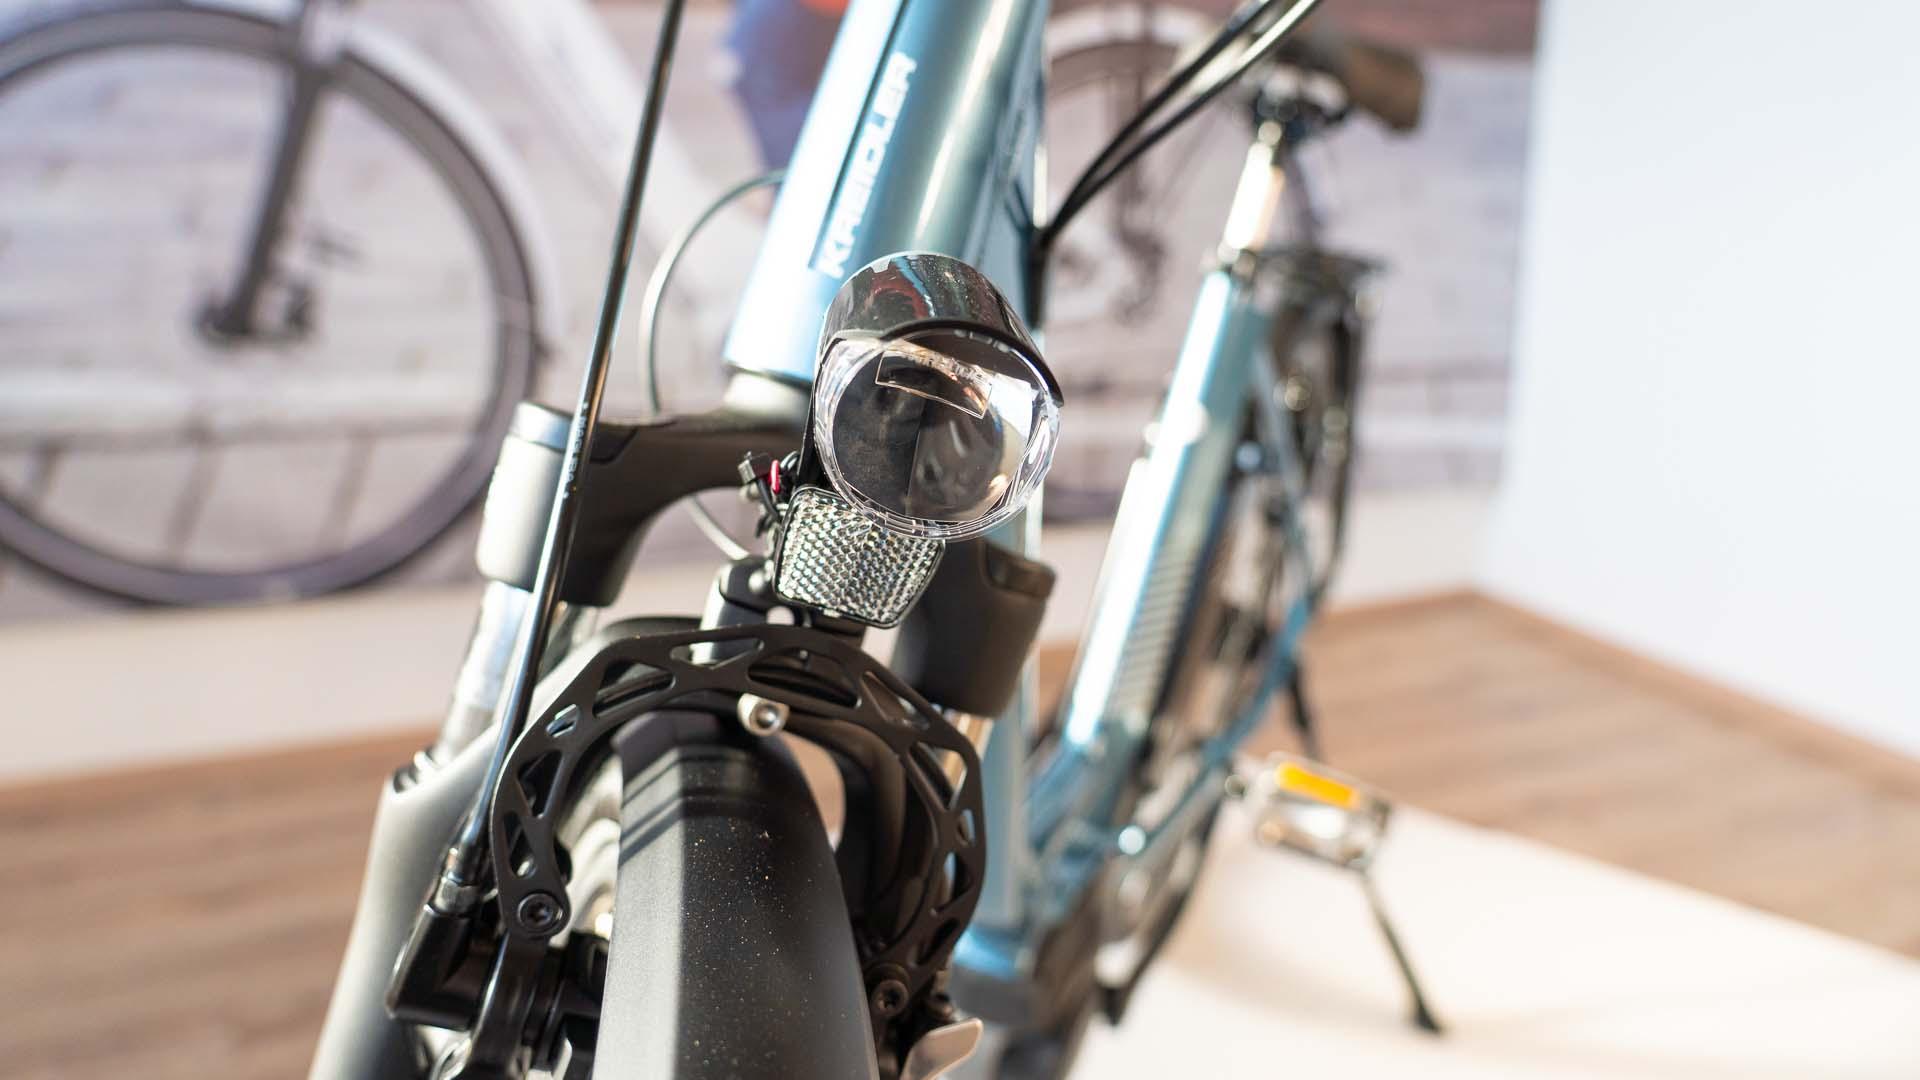 Fahrradzentrum Grauthoff Fotoshooting 25